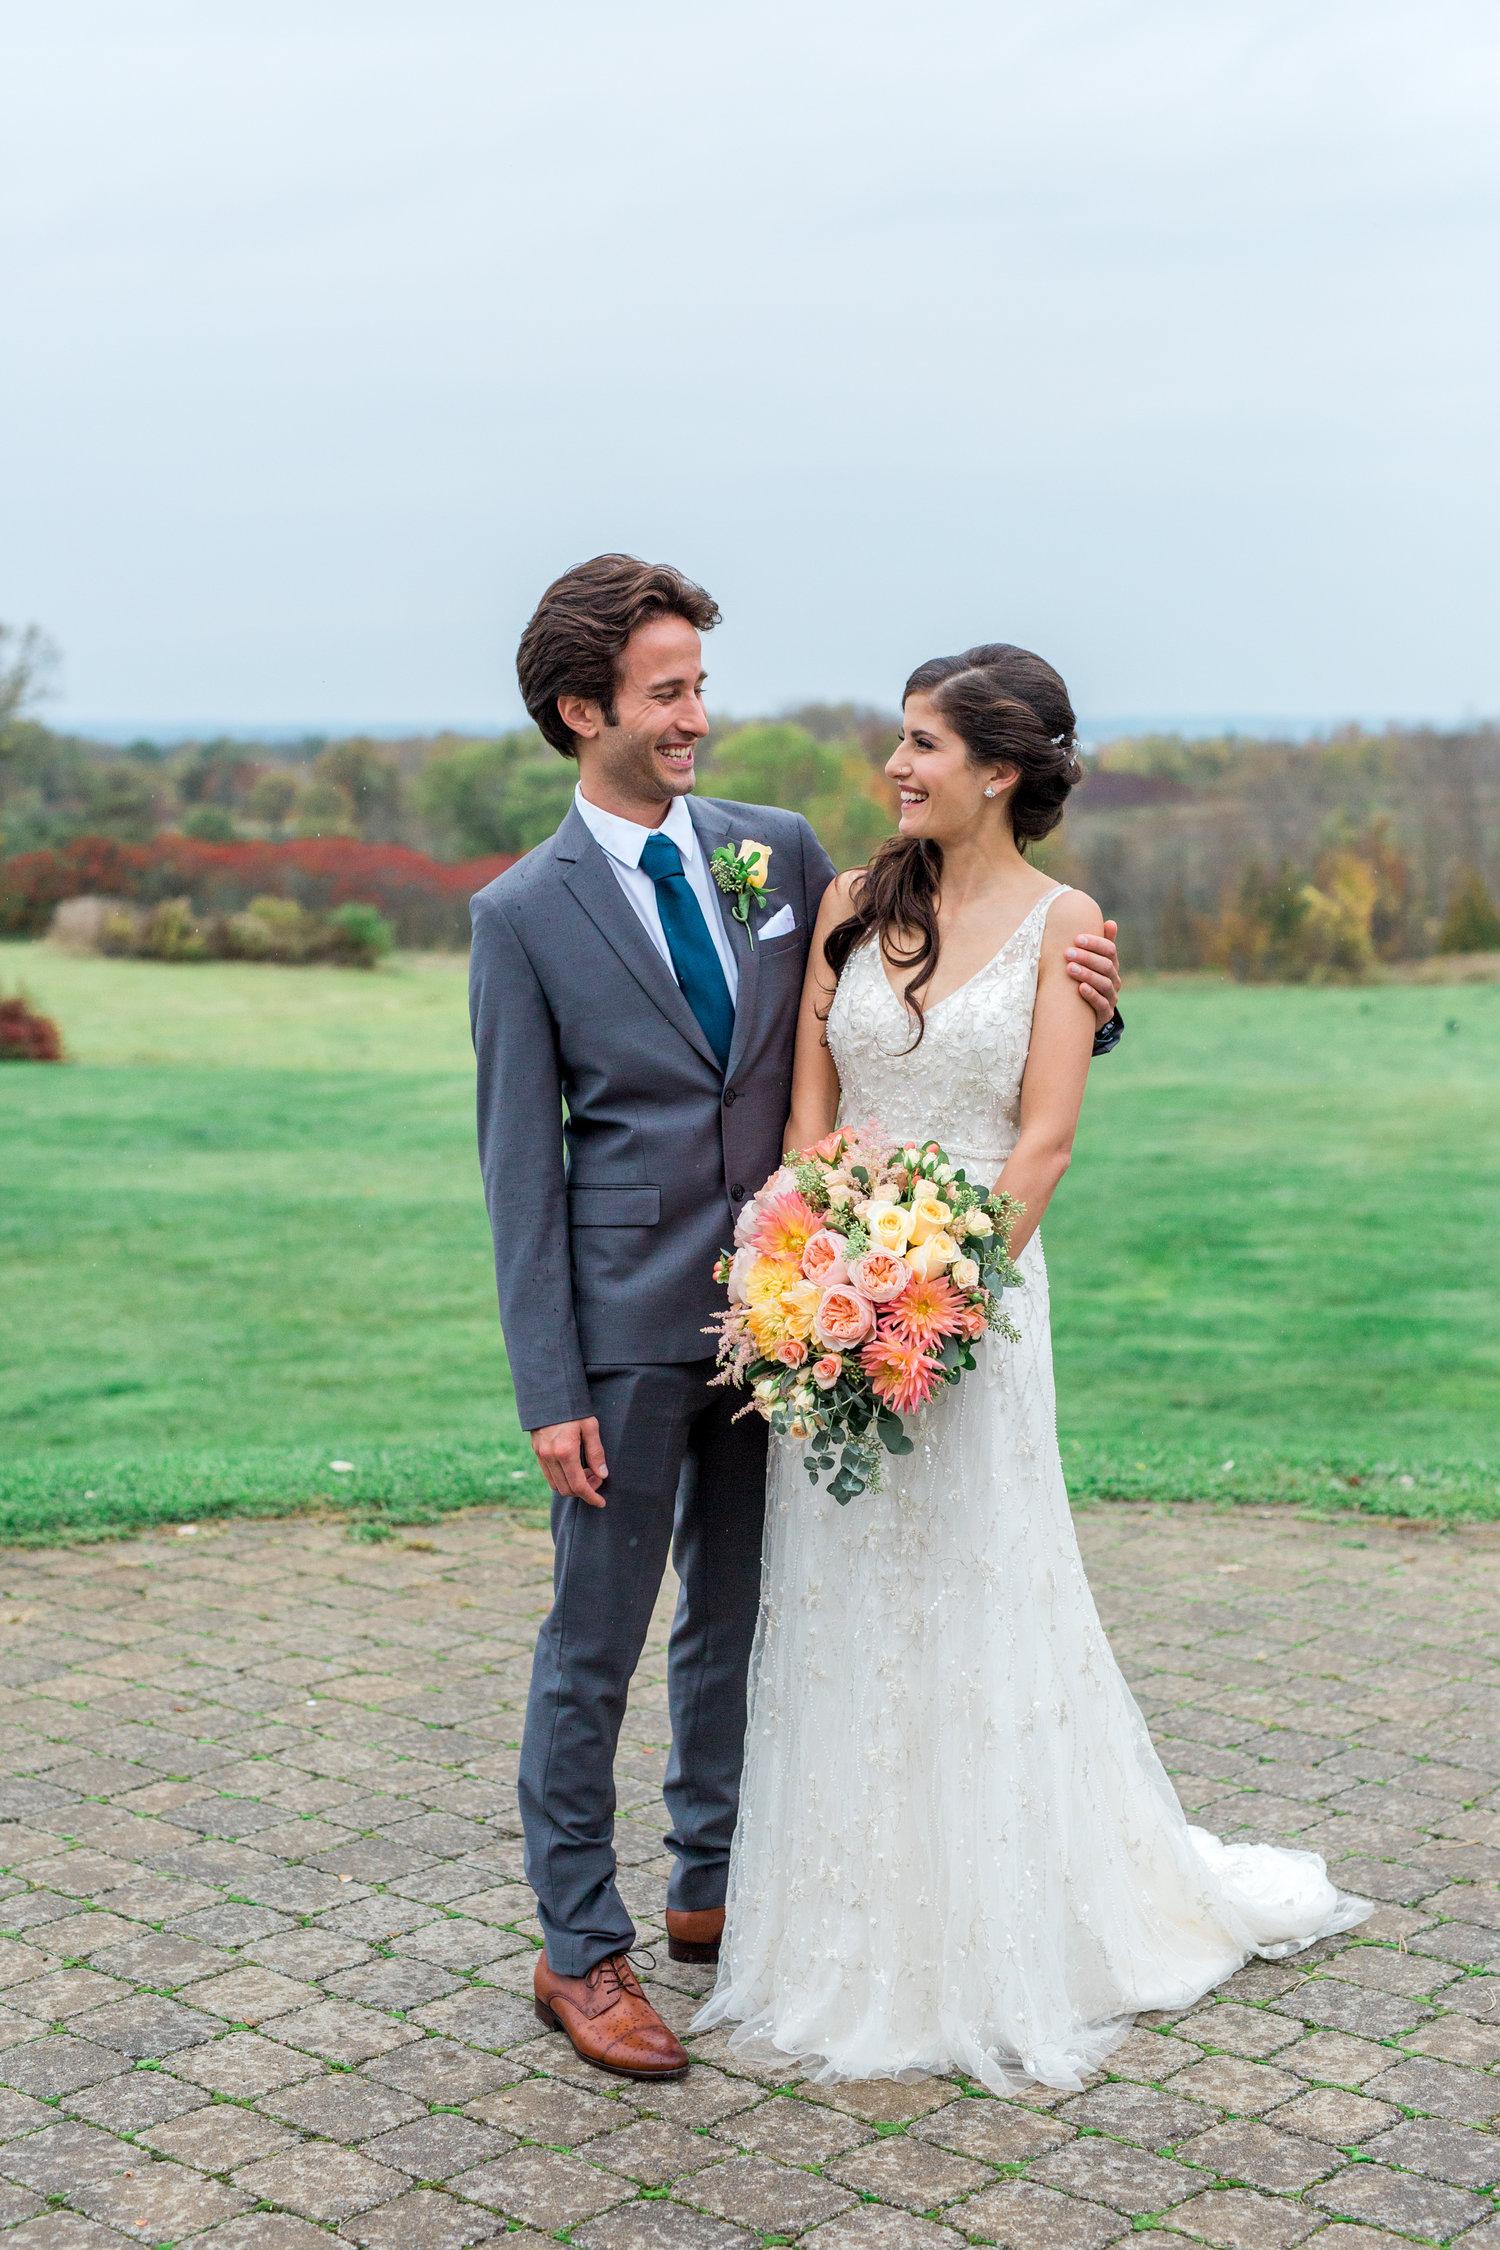 Amir-Golbazi-Danielle-Giroux-Photography_Toronto-Wedding_Cedarwood_Rachel-Paul_421.jpg